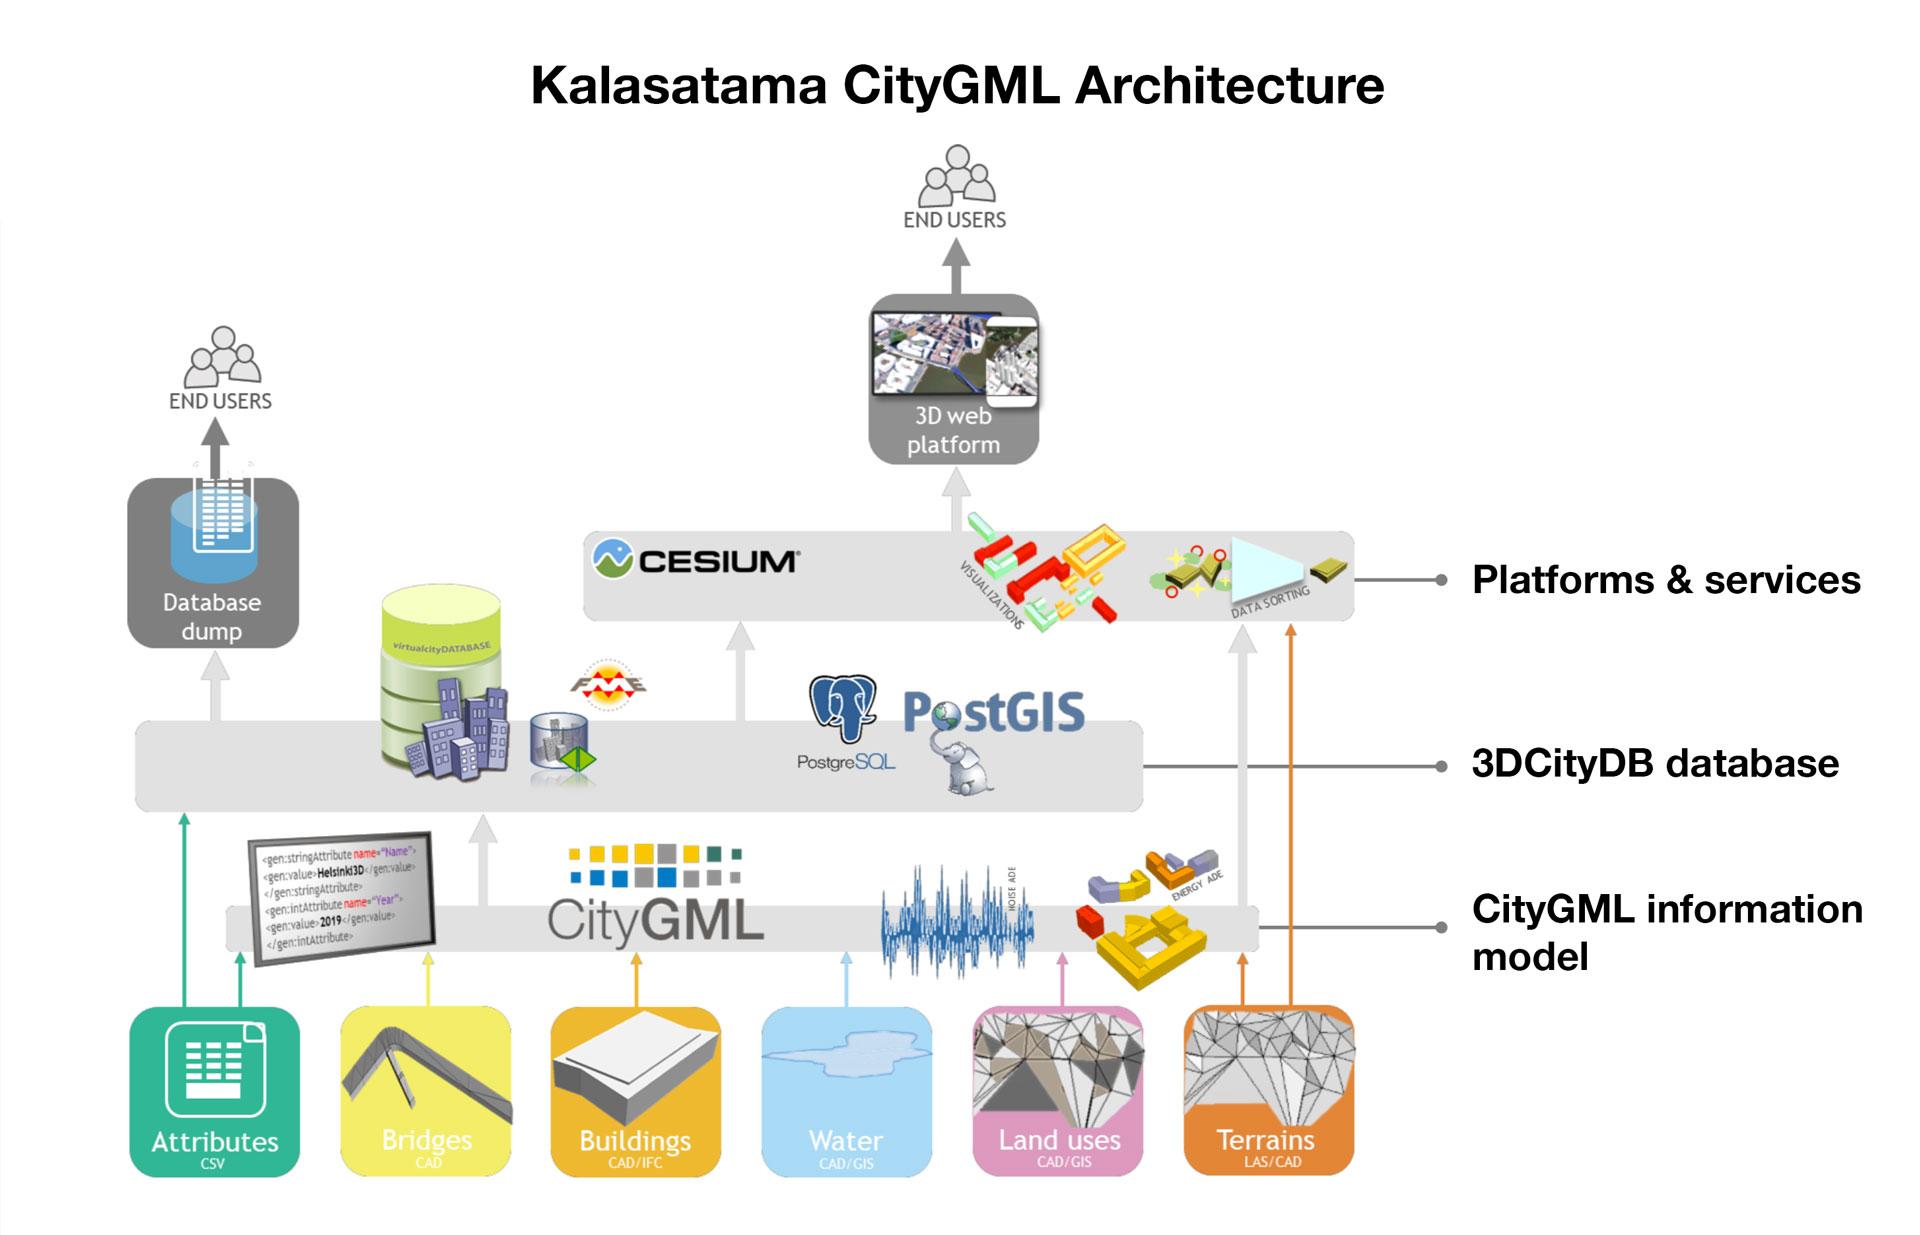 CityGML Architecture